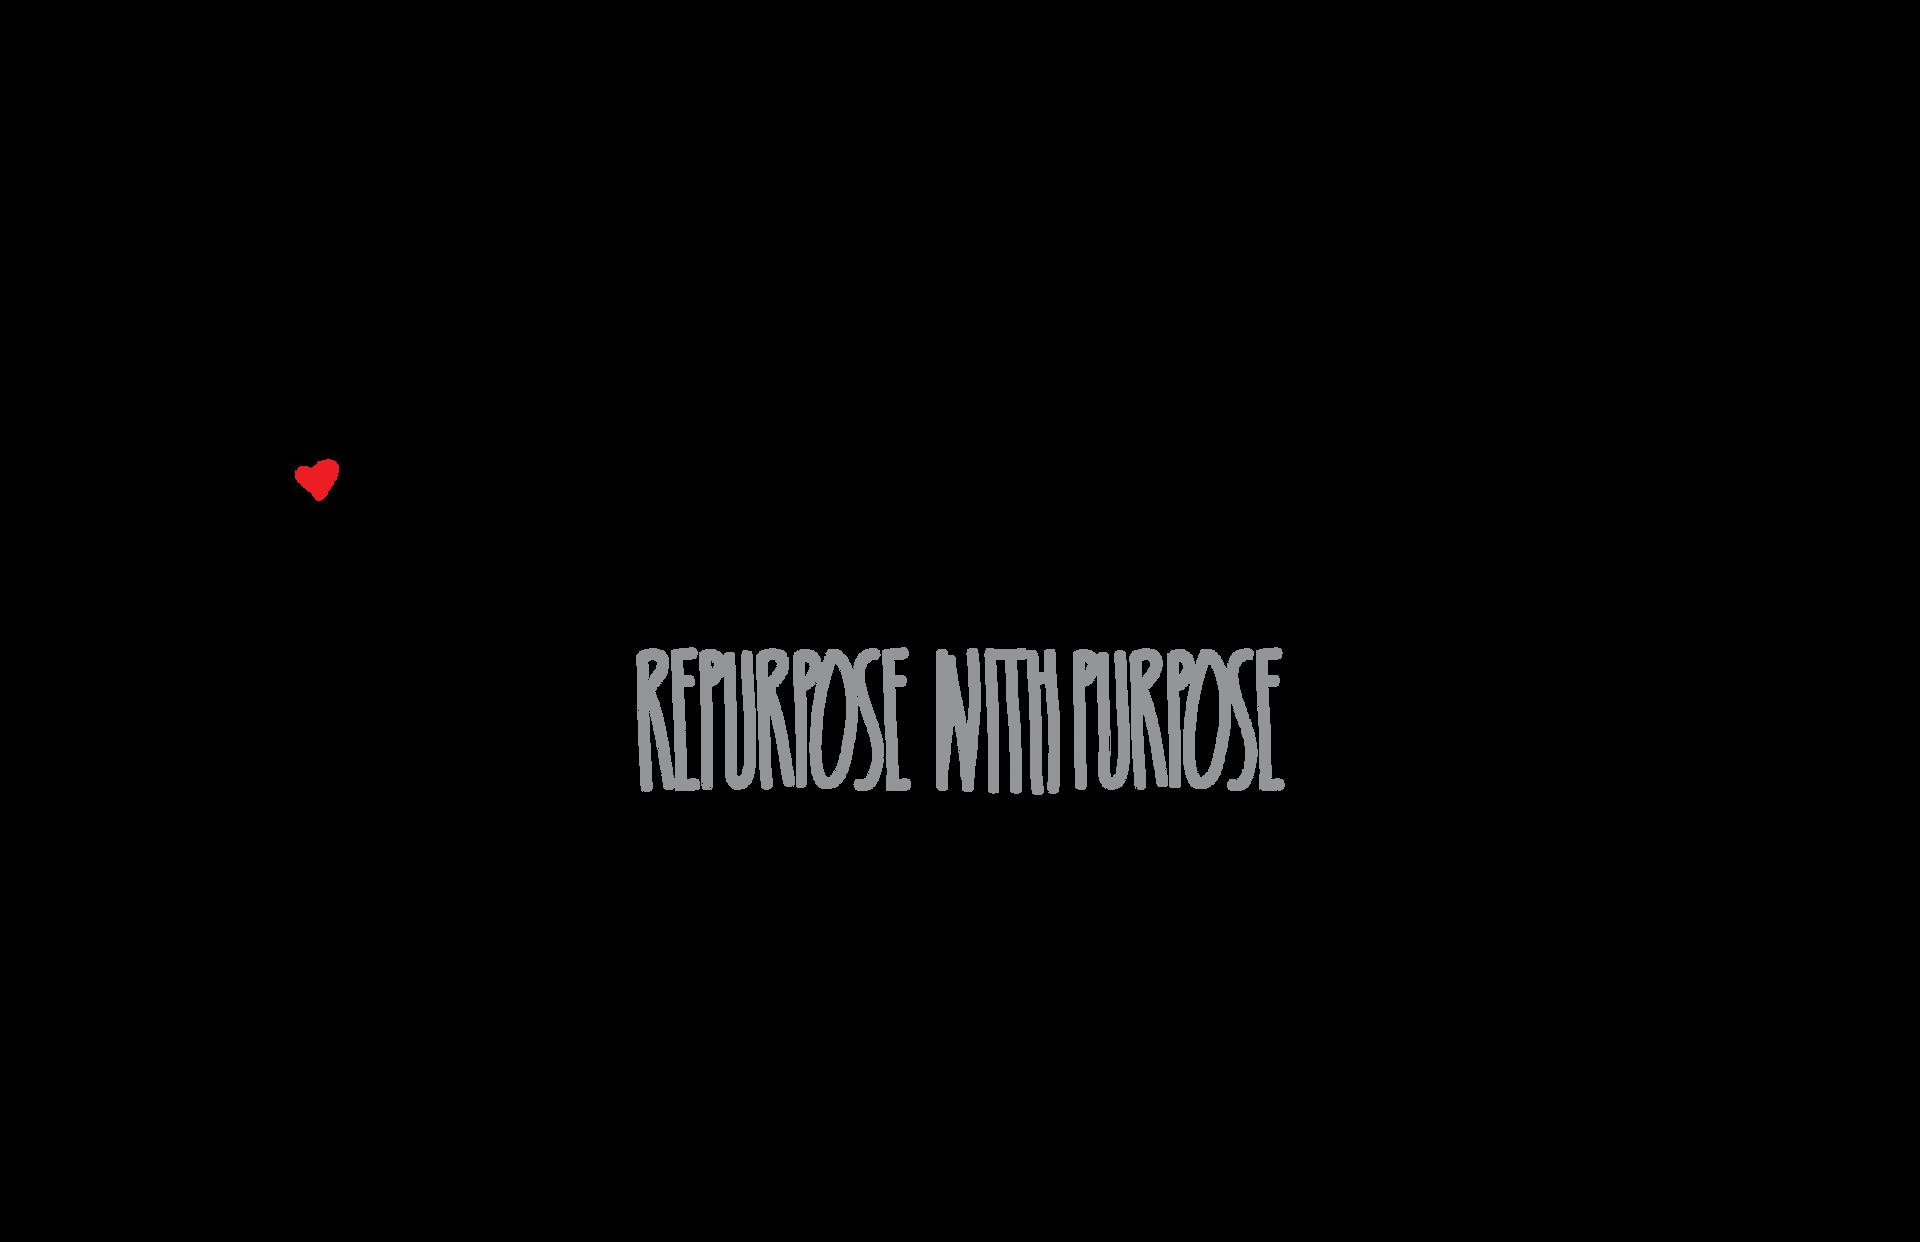 Logo design for small business.